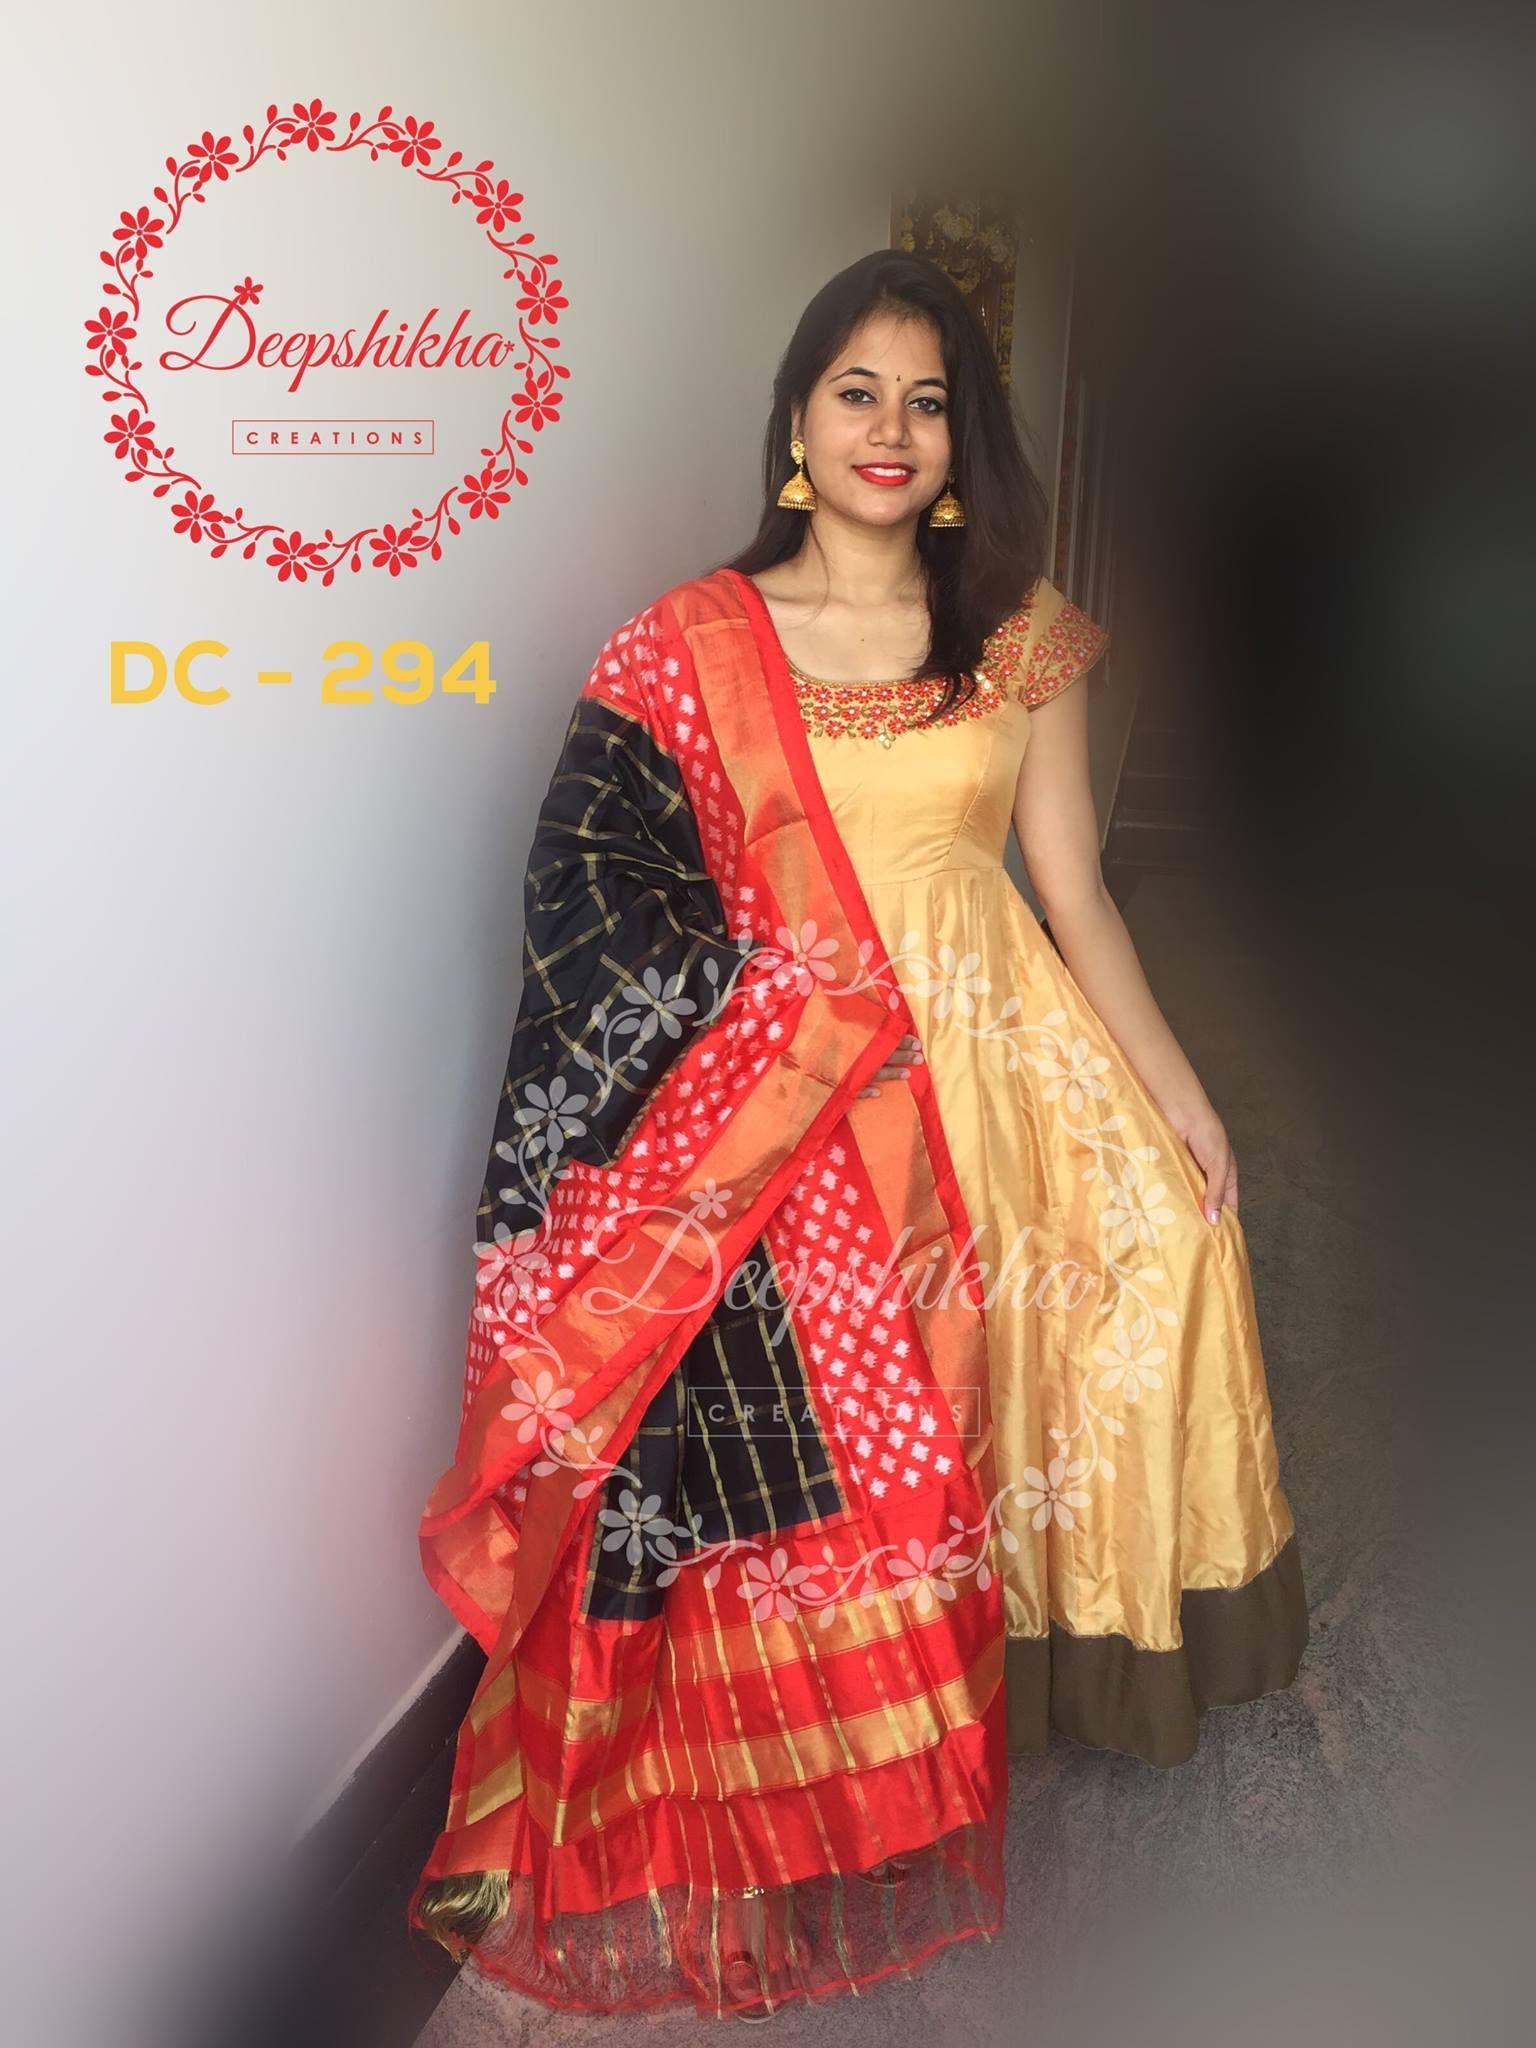 05feb4905430d Deepshikha Creations. Hyderabad Contact   9059683293. Mail    deepshikhacreations gmail.com. 22 August 2016